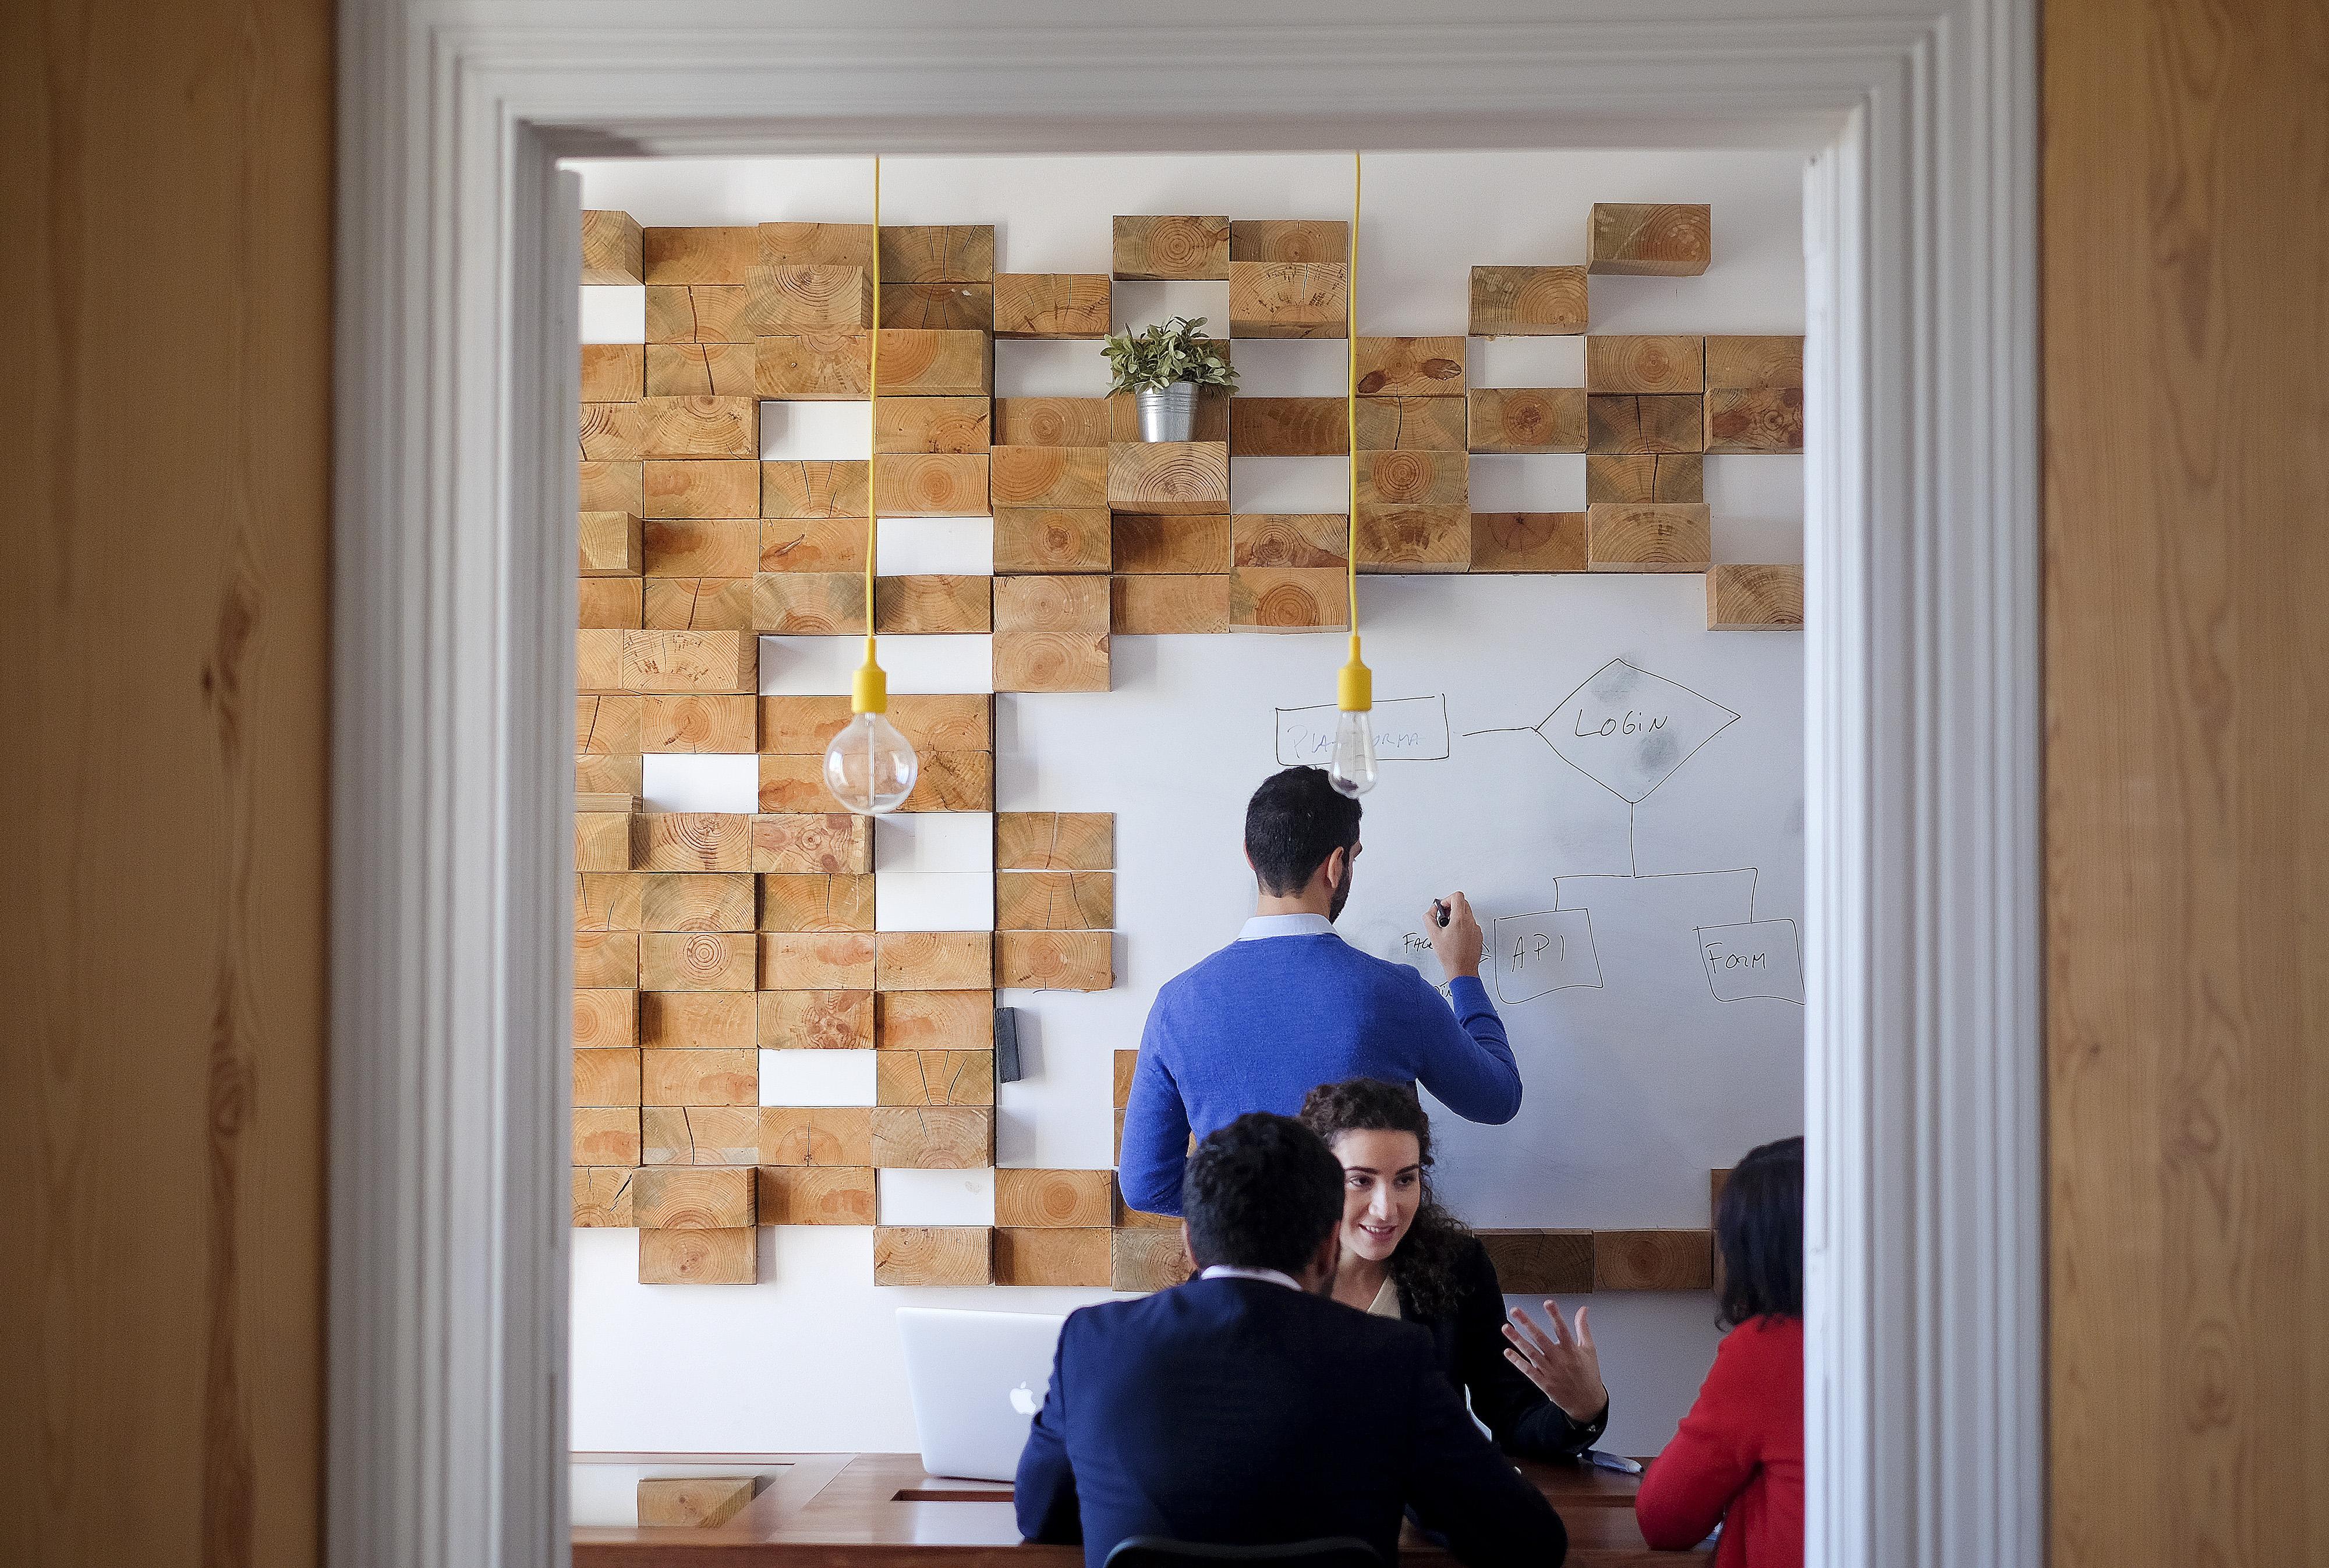 Startup Enterprises At Portugal's Tech Hubs